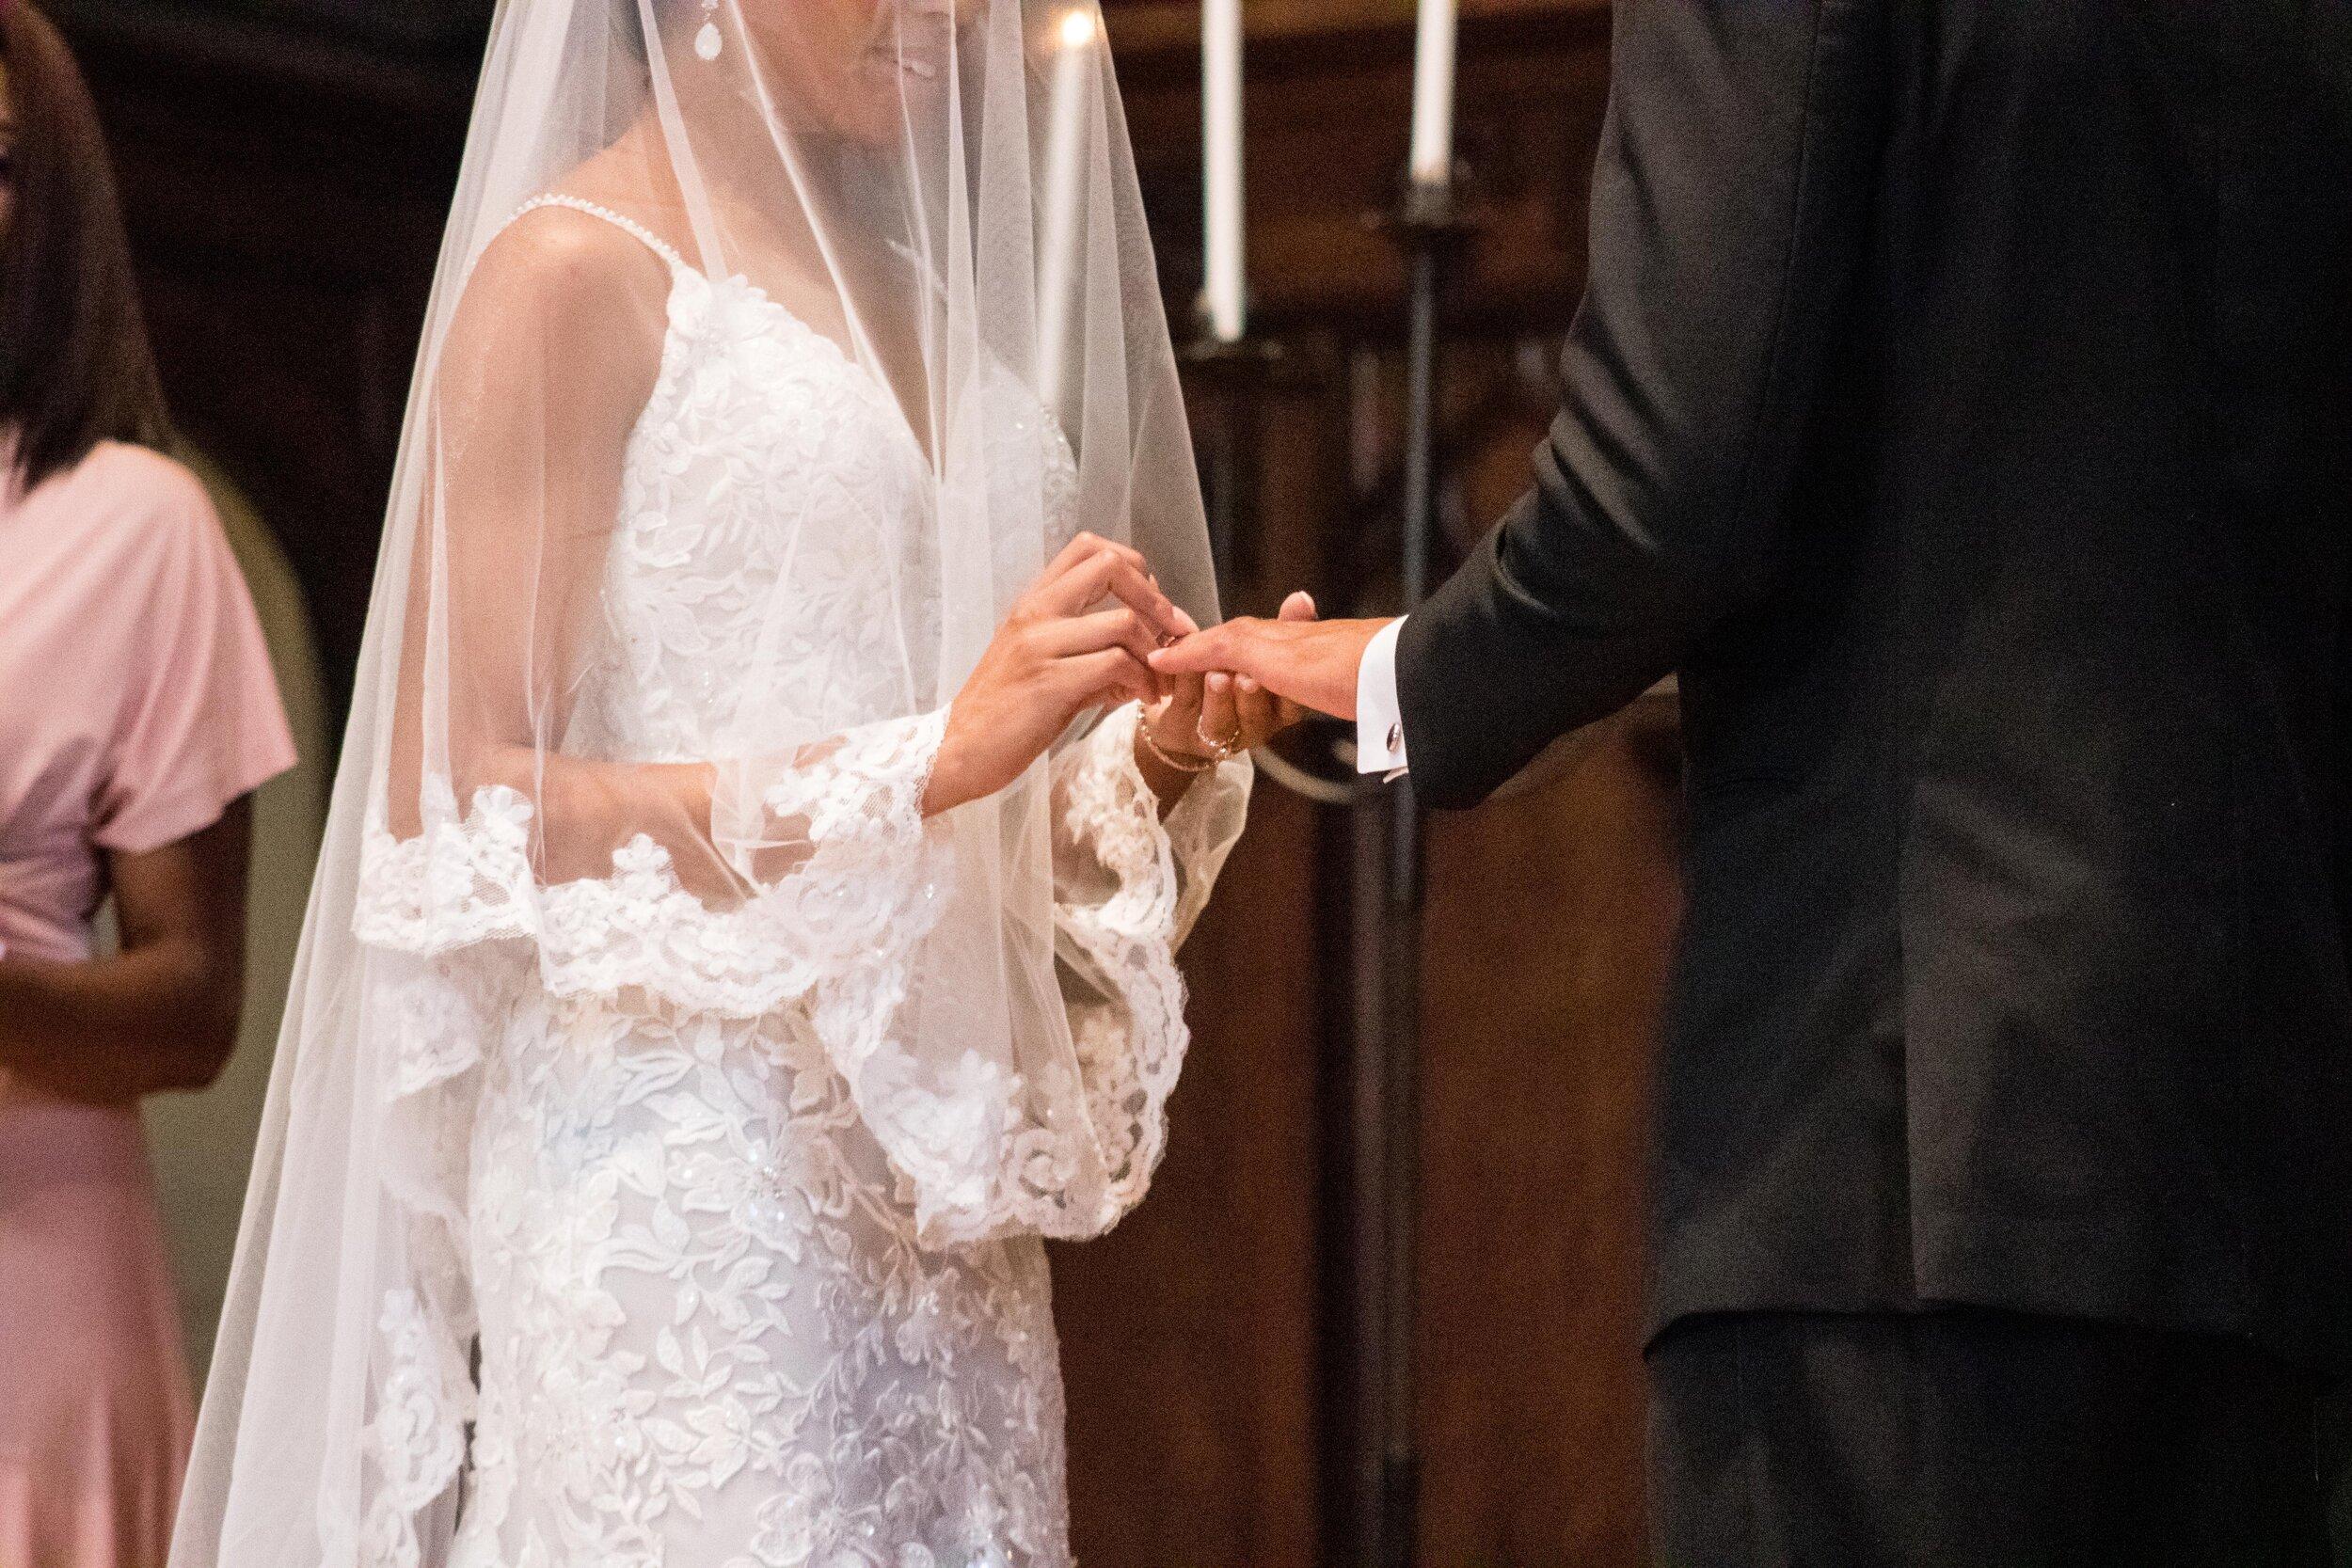 8_3_2019_BONTY_WEDDING-366.jpg